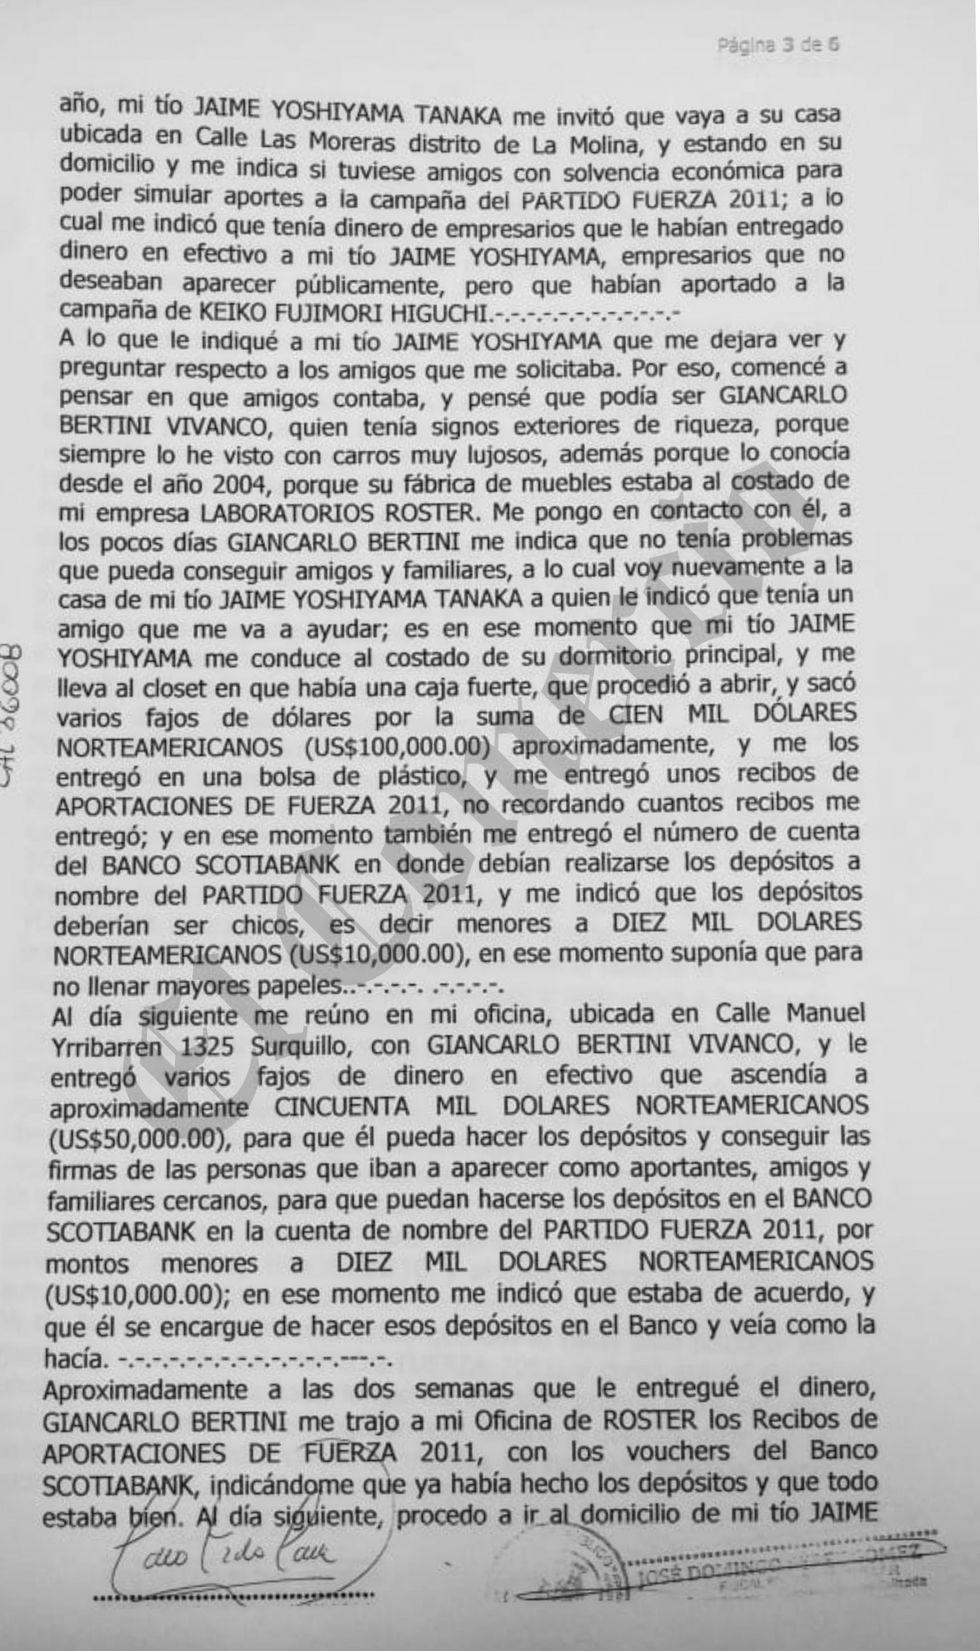 Declaración de Jorge Yoshiyama.